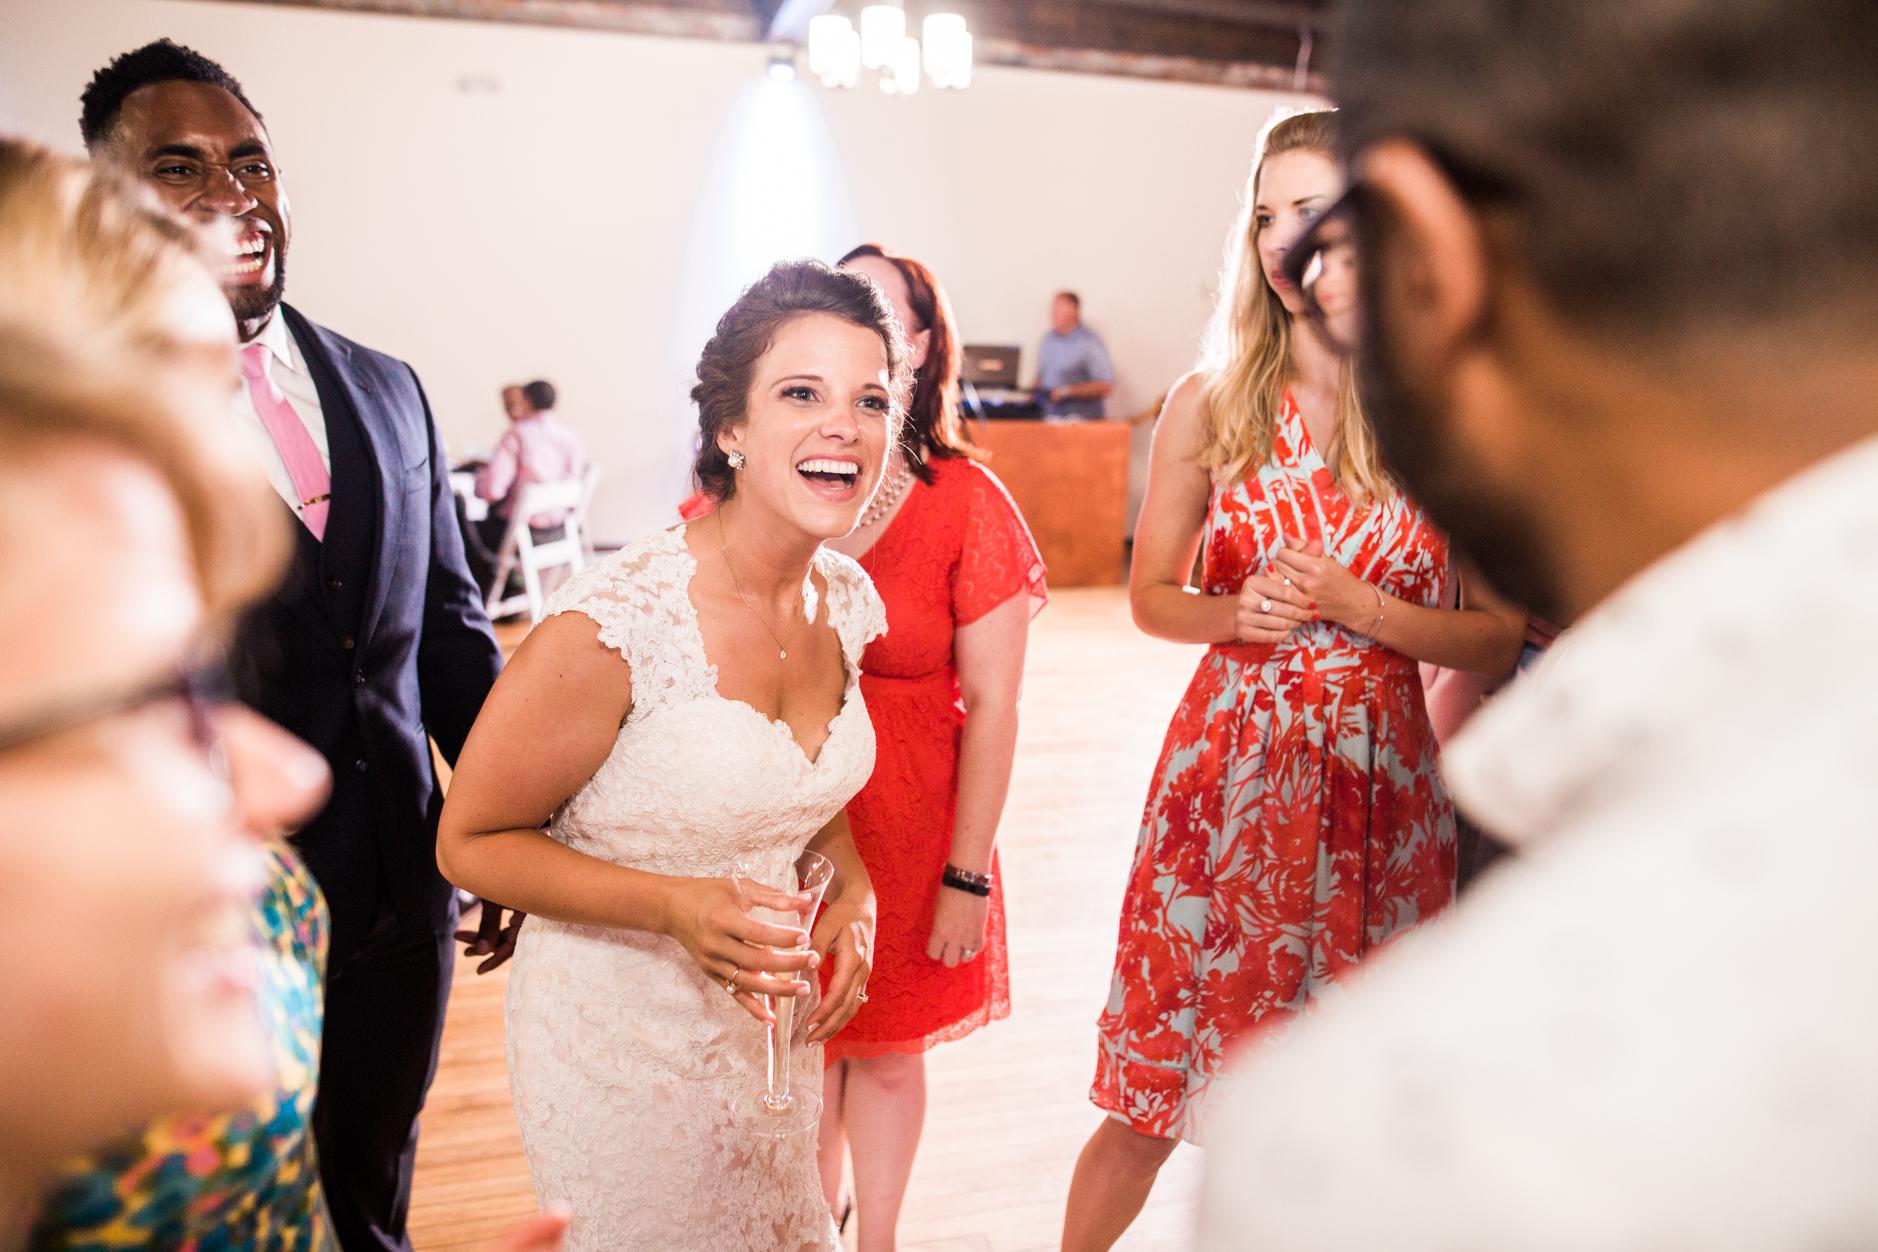 LegacyUnion-Wedding-Photographer-Glendale-CA-63.jpg